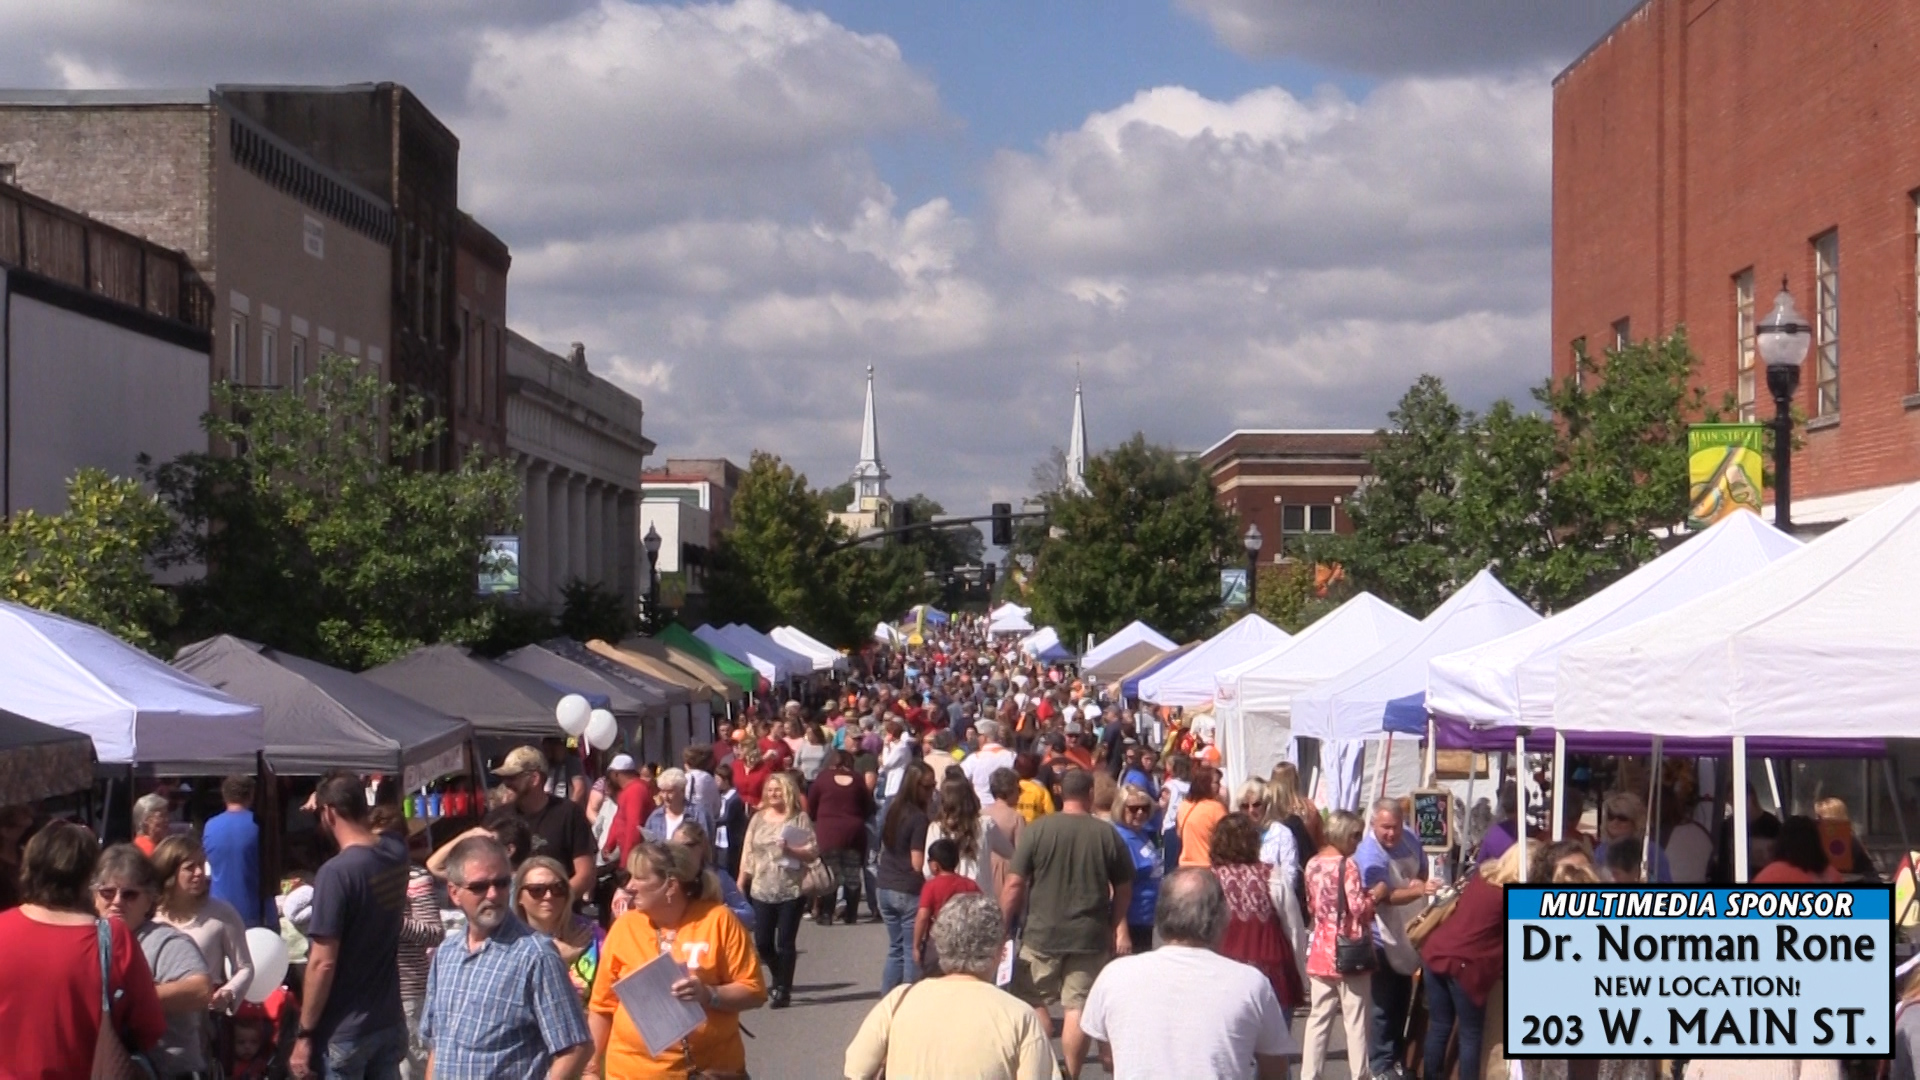 VIDEO - The McMinnville Autumn Street Fair